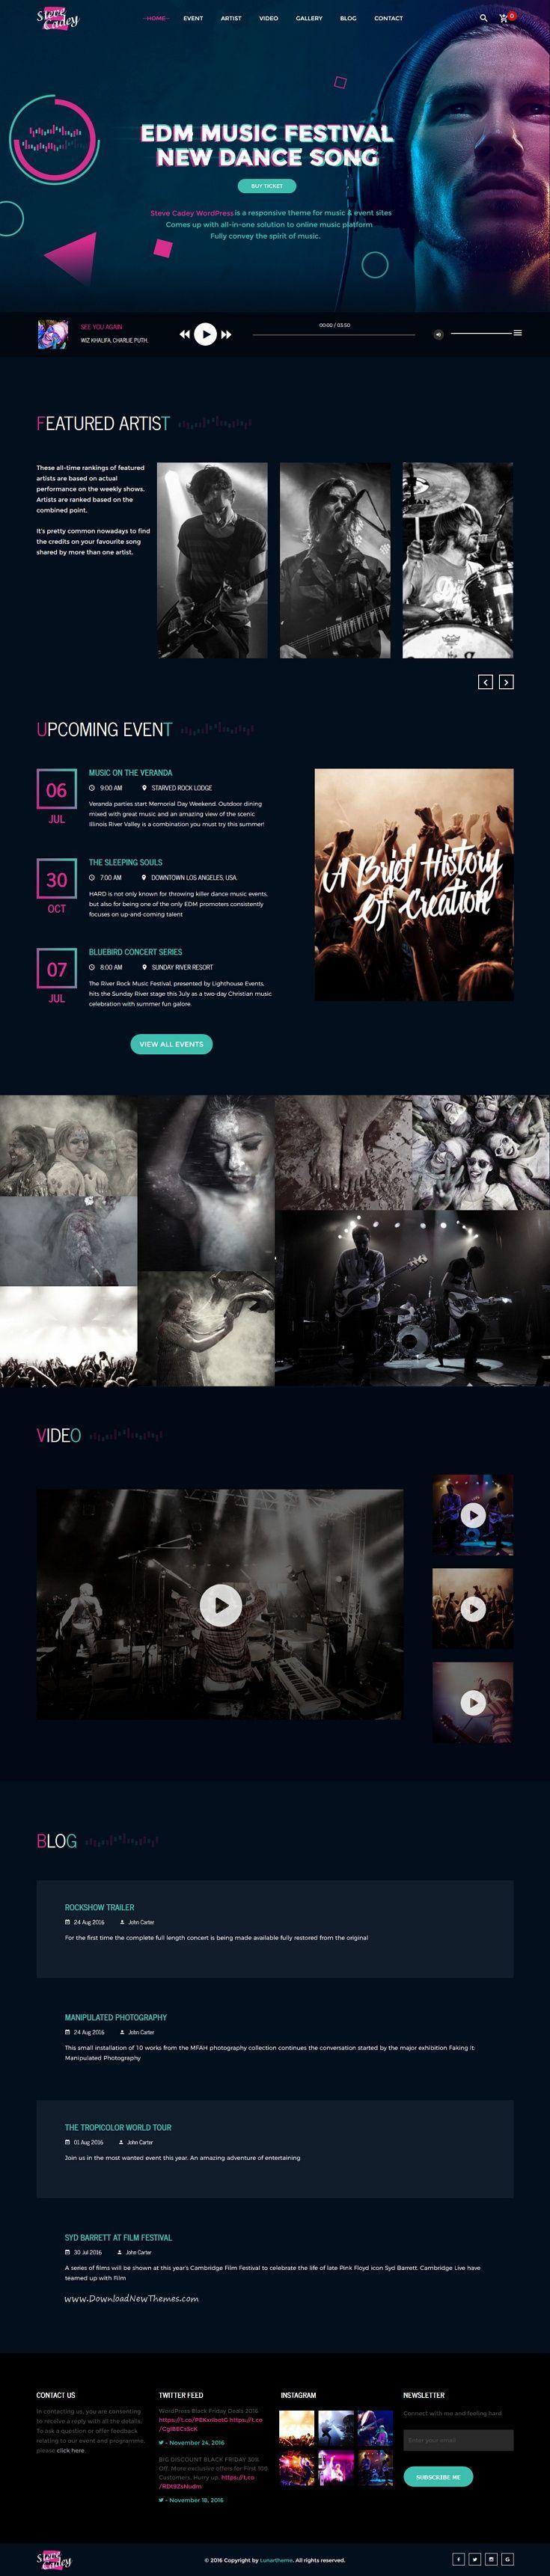 Steve Cadey is a responsive #WordPress theme for #music and #events website #webdev download now➩ https://themeforest.net/item/steve-cadey-wordpress-music-theme-for-musicians-djs-bands-solo-artists/18155951?ref=Datasata